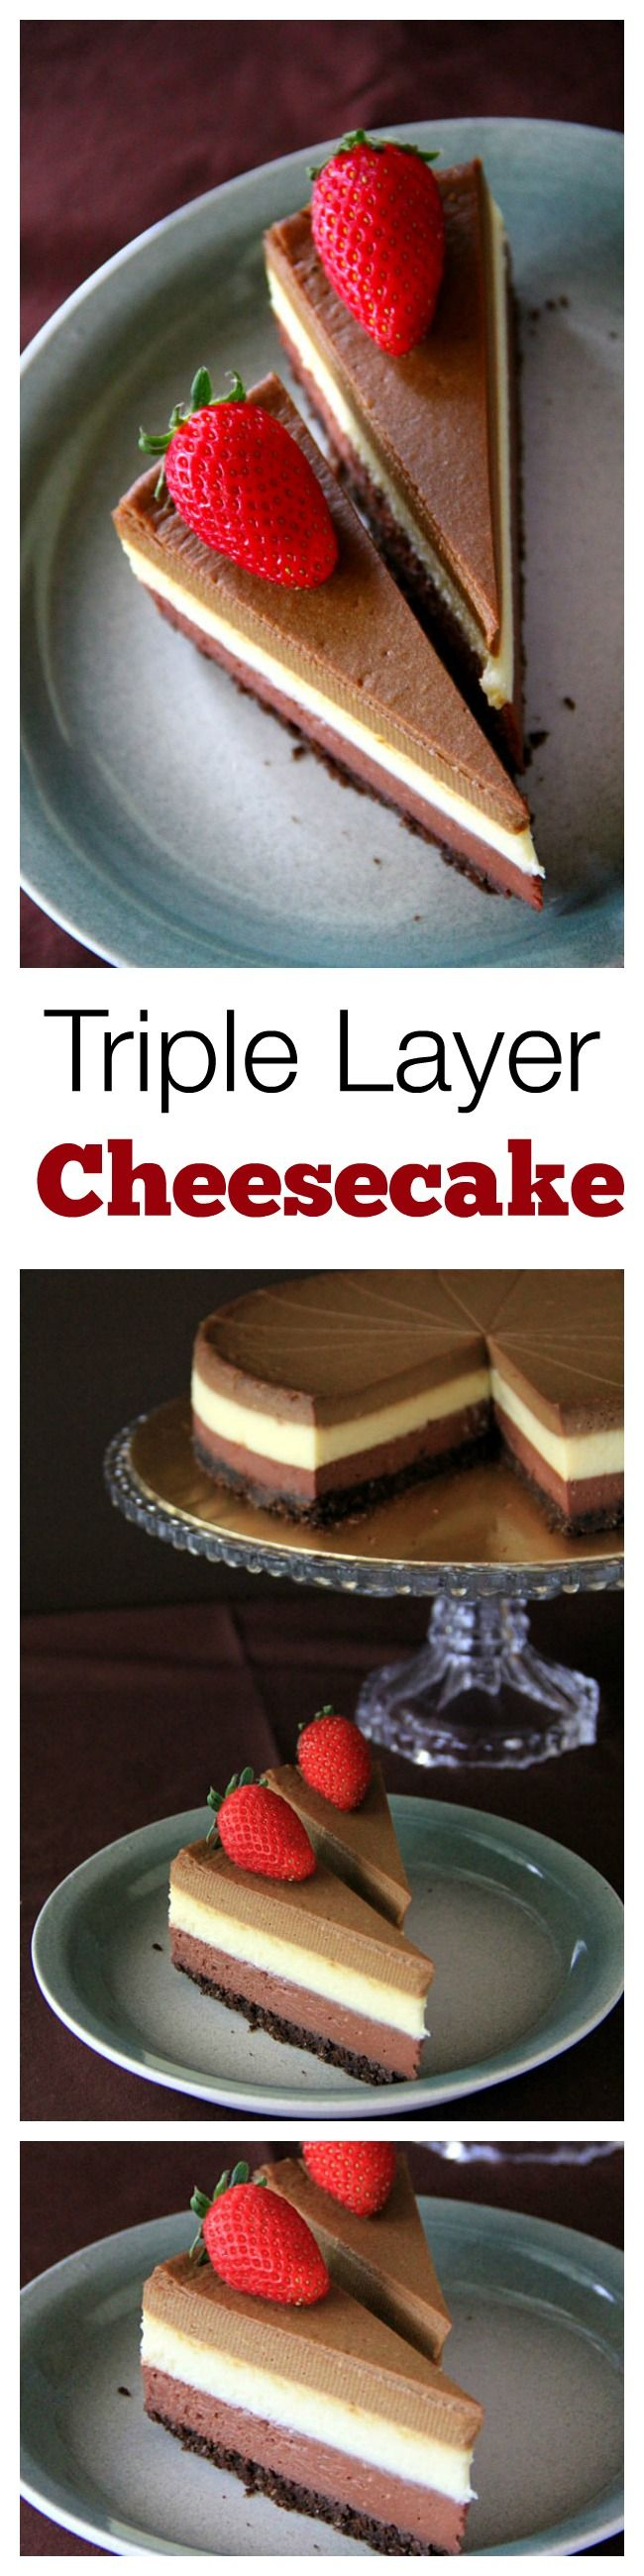 Triple Layer Cheesecake – the BEST, creamiest, richest cheesecake you'll ever make, in dark chocolate, white chocolate & Kahlua coffee flavor